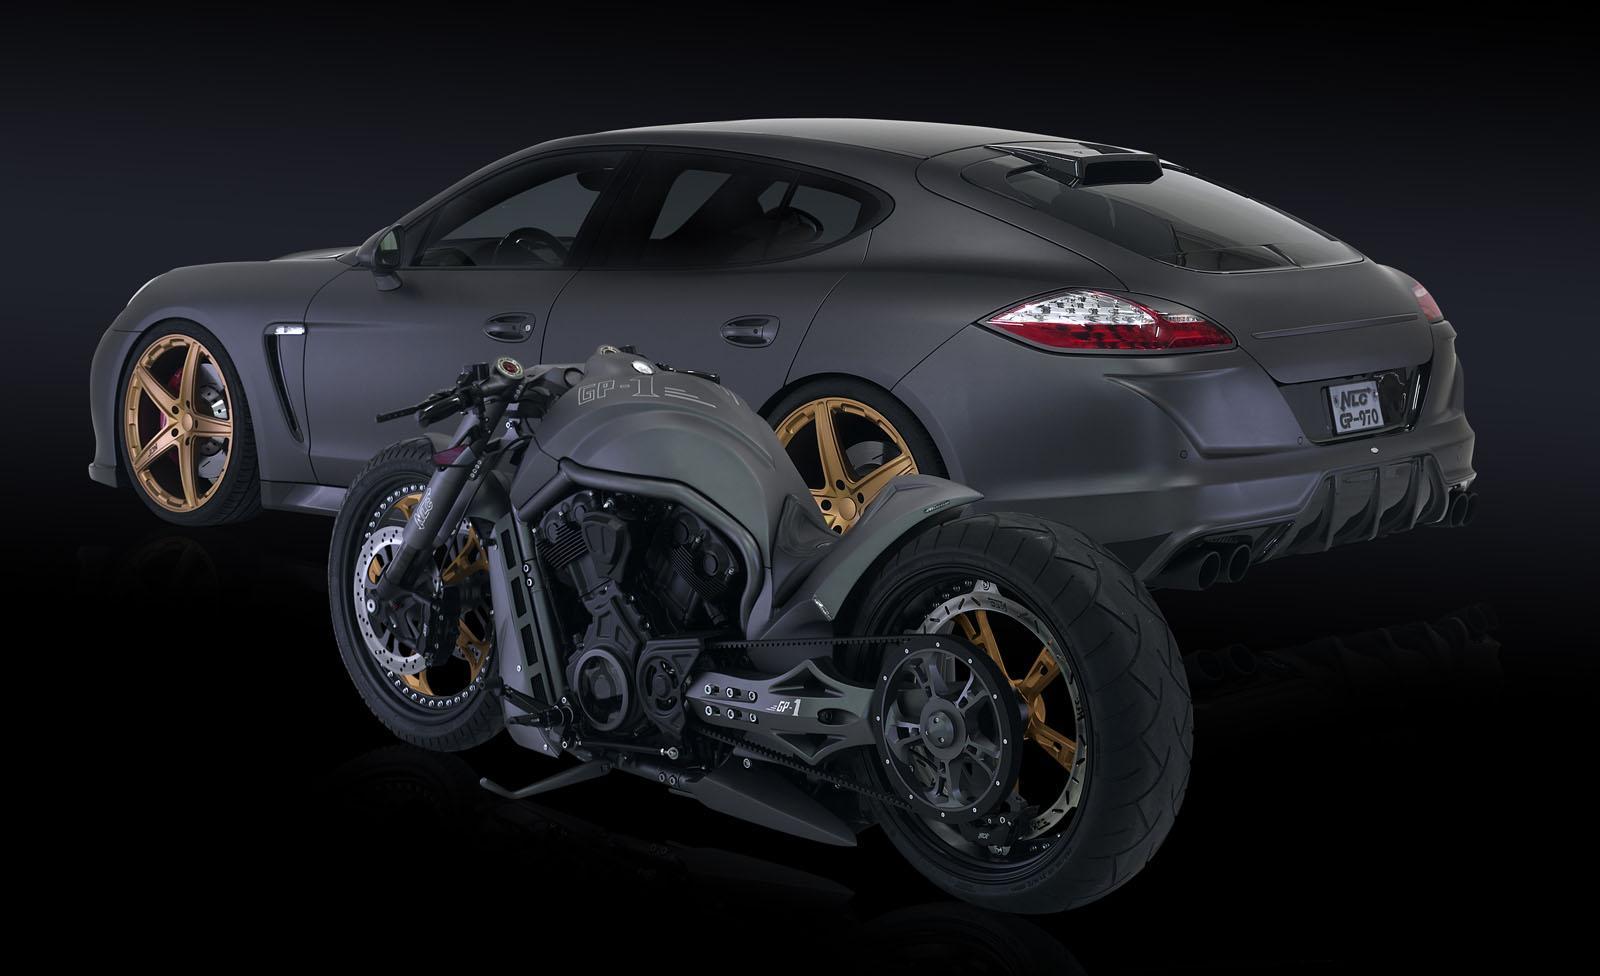 2012 NLC Porsche Panamera GP 970 Tuning Chopper Motorcycle